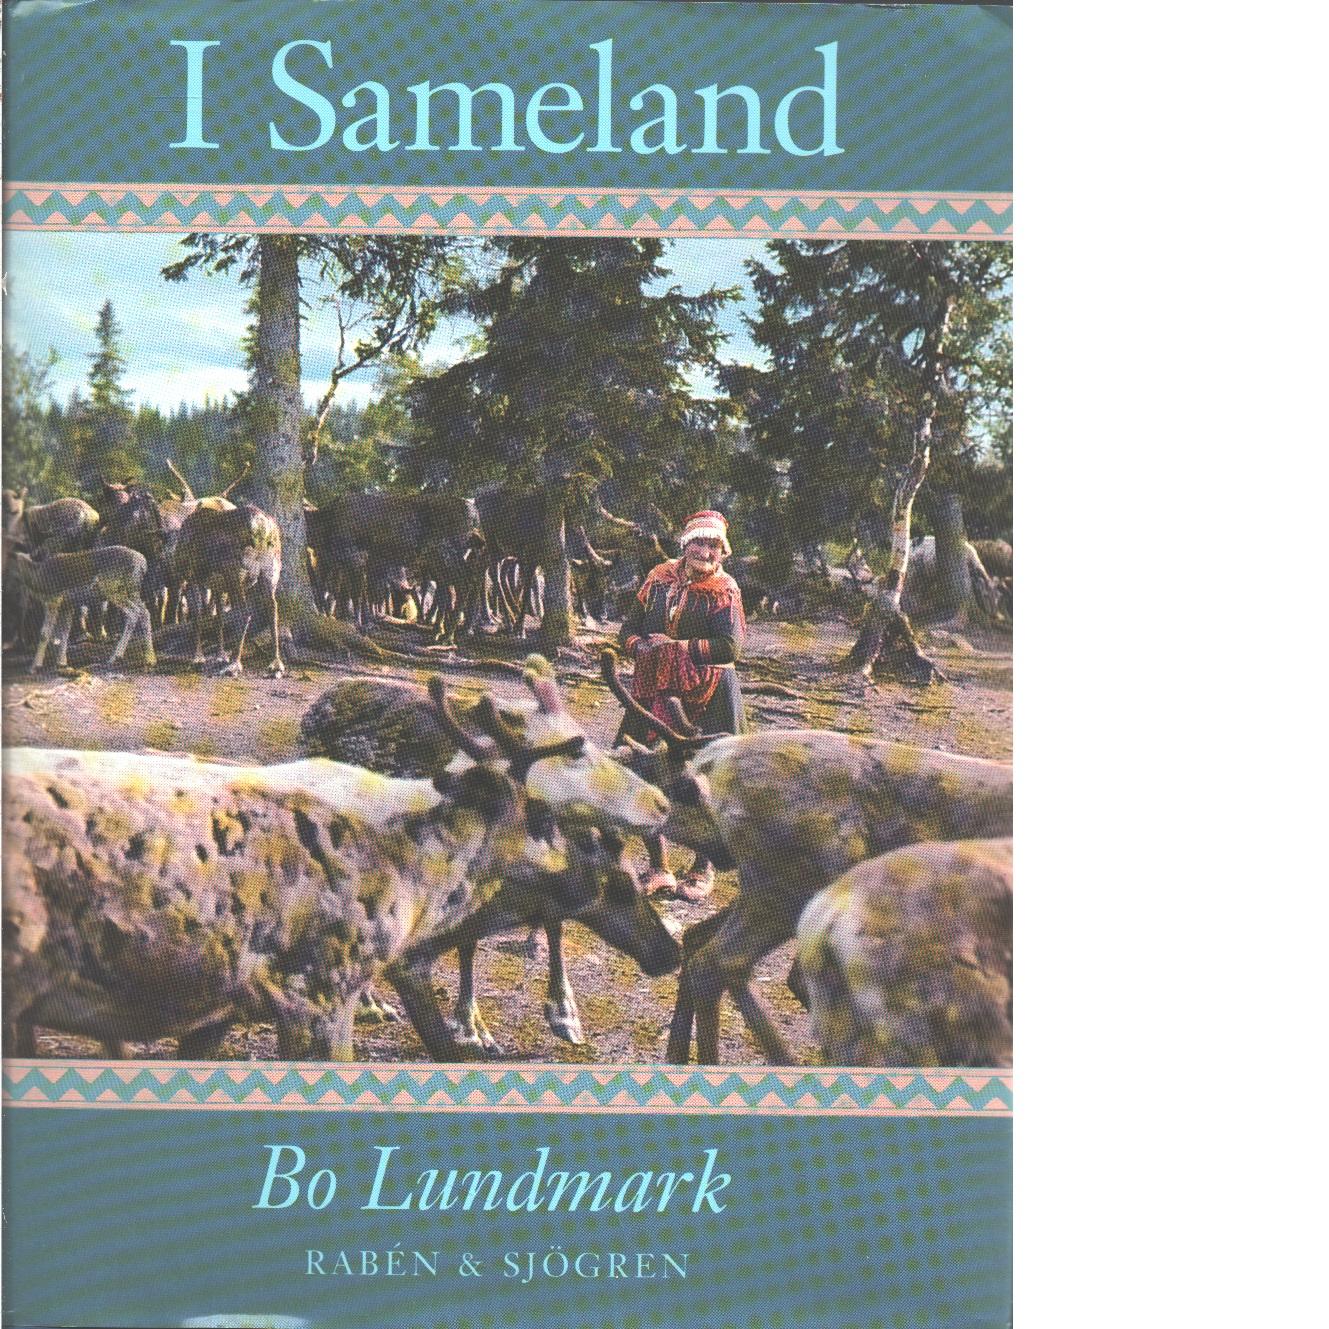 I Sameland - Lundmark, Bo